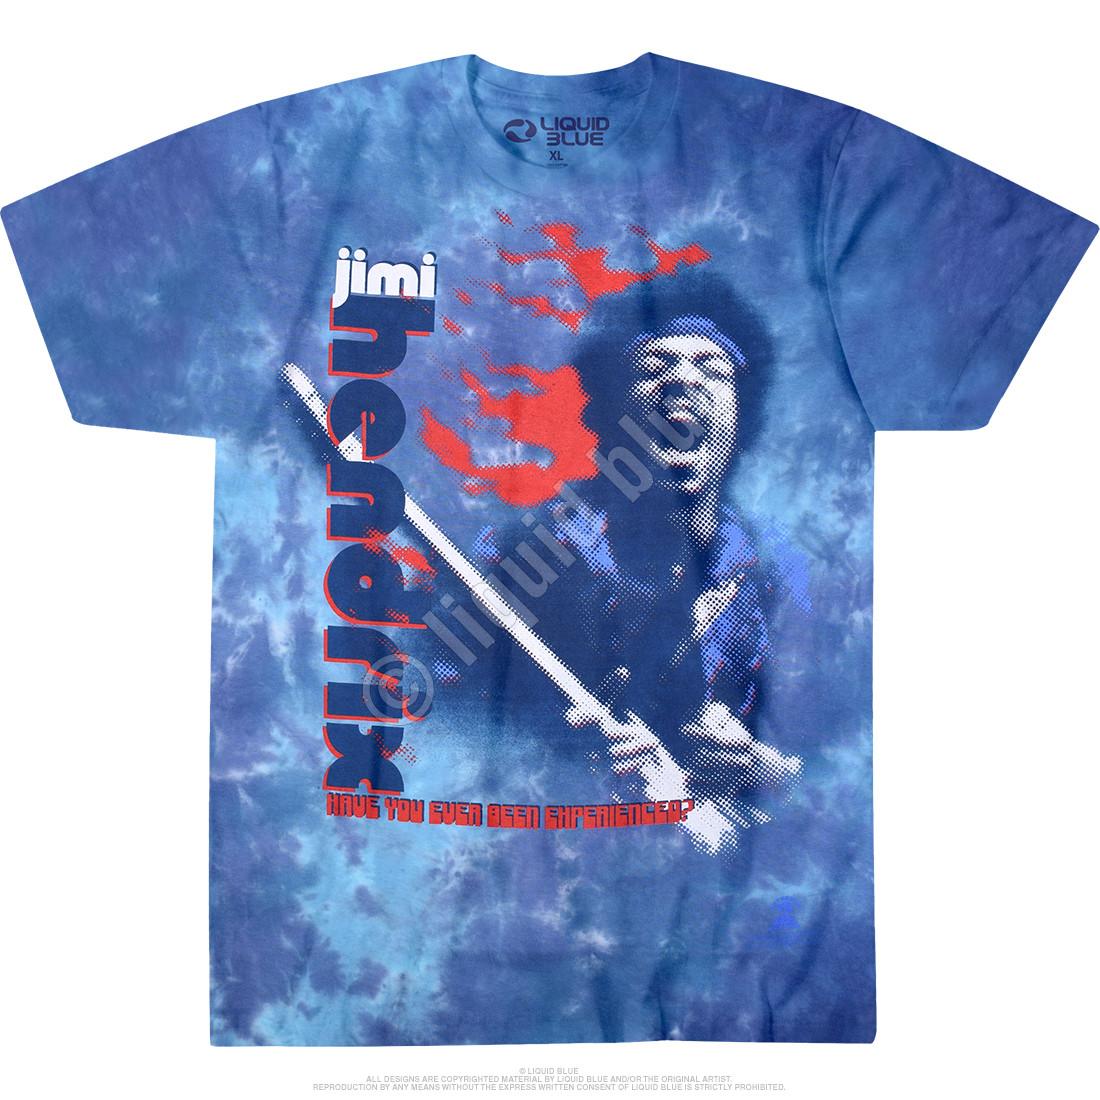 L 2XL Tie Dye T-Shirt XL Jimi Hendrix Purple Haze M